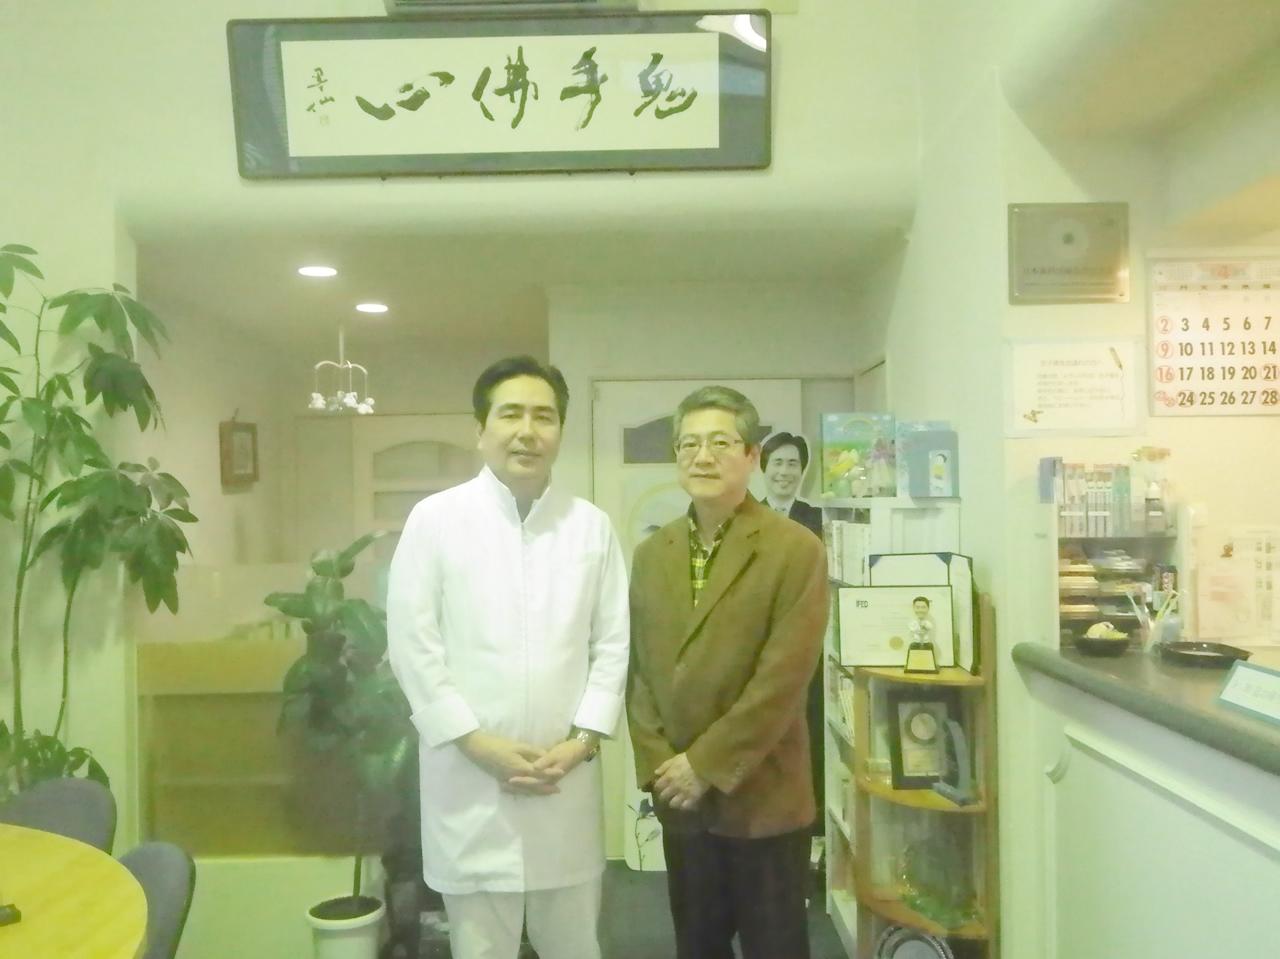 H29.4.9     Dr. 杉山 インプラント